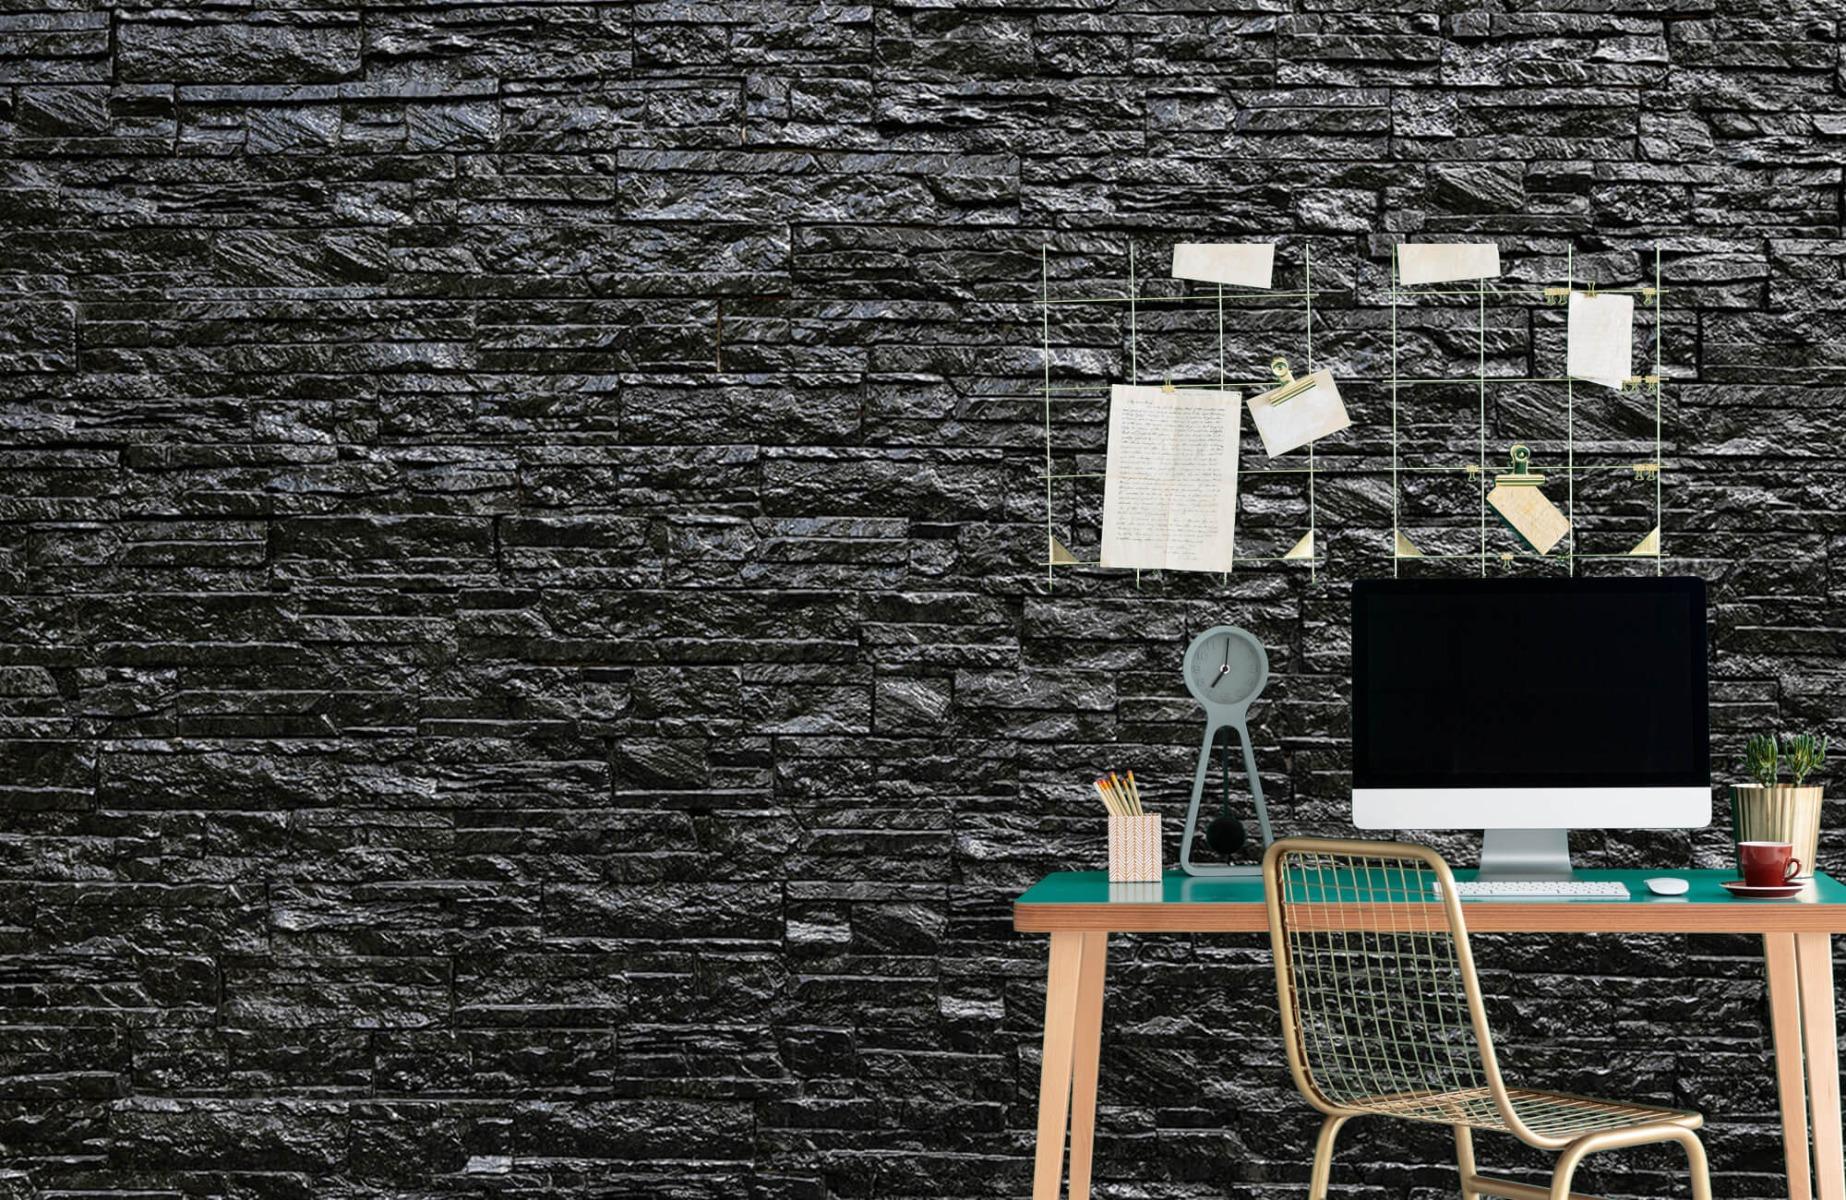 Steen behang - Zwarte stenen - Slaapkamer 7